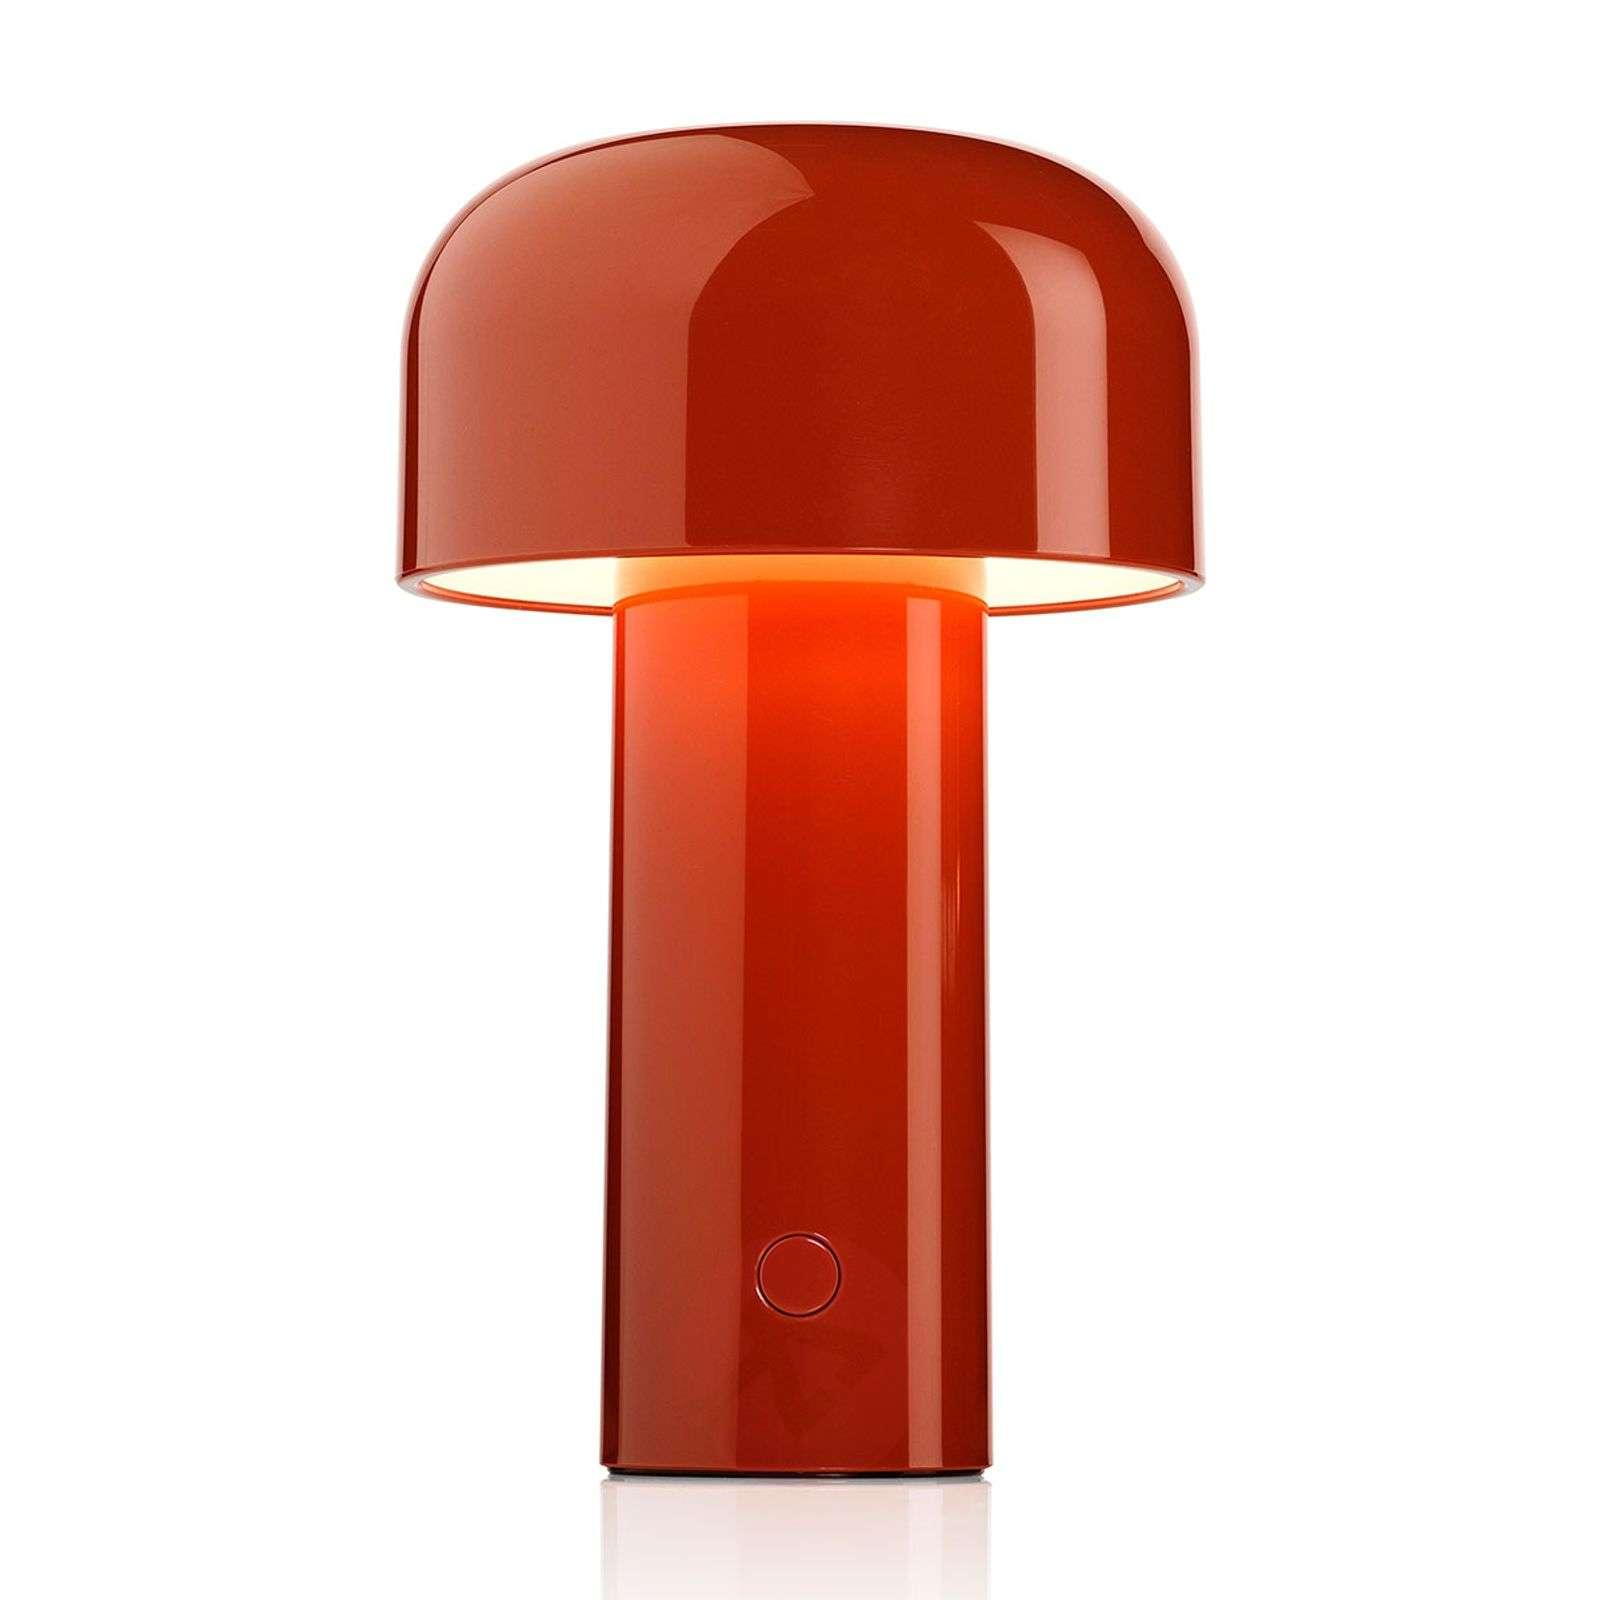 FLOS Bellhop LED-pöytävalaisin-3510491X-01